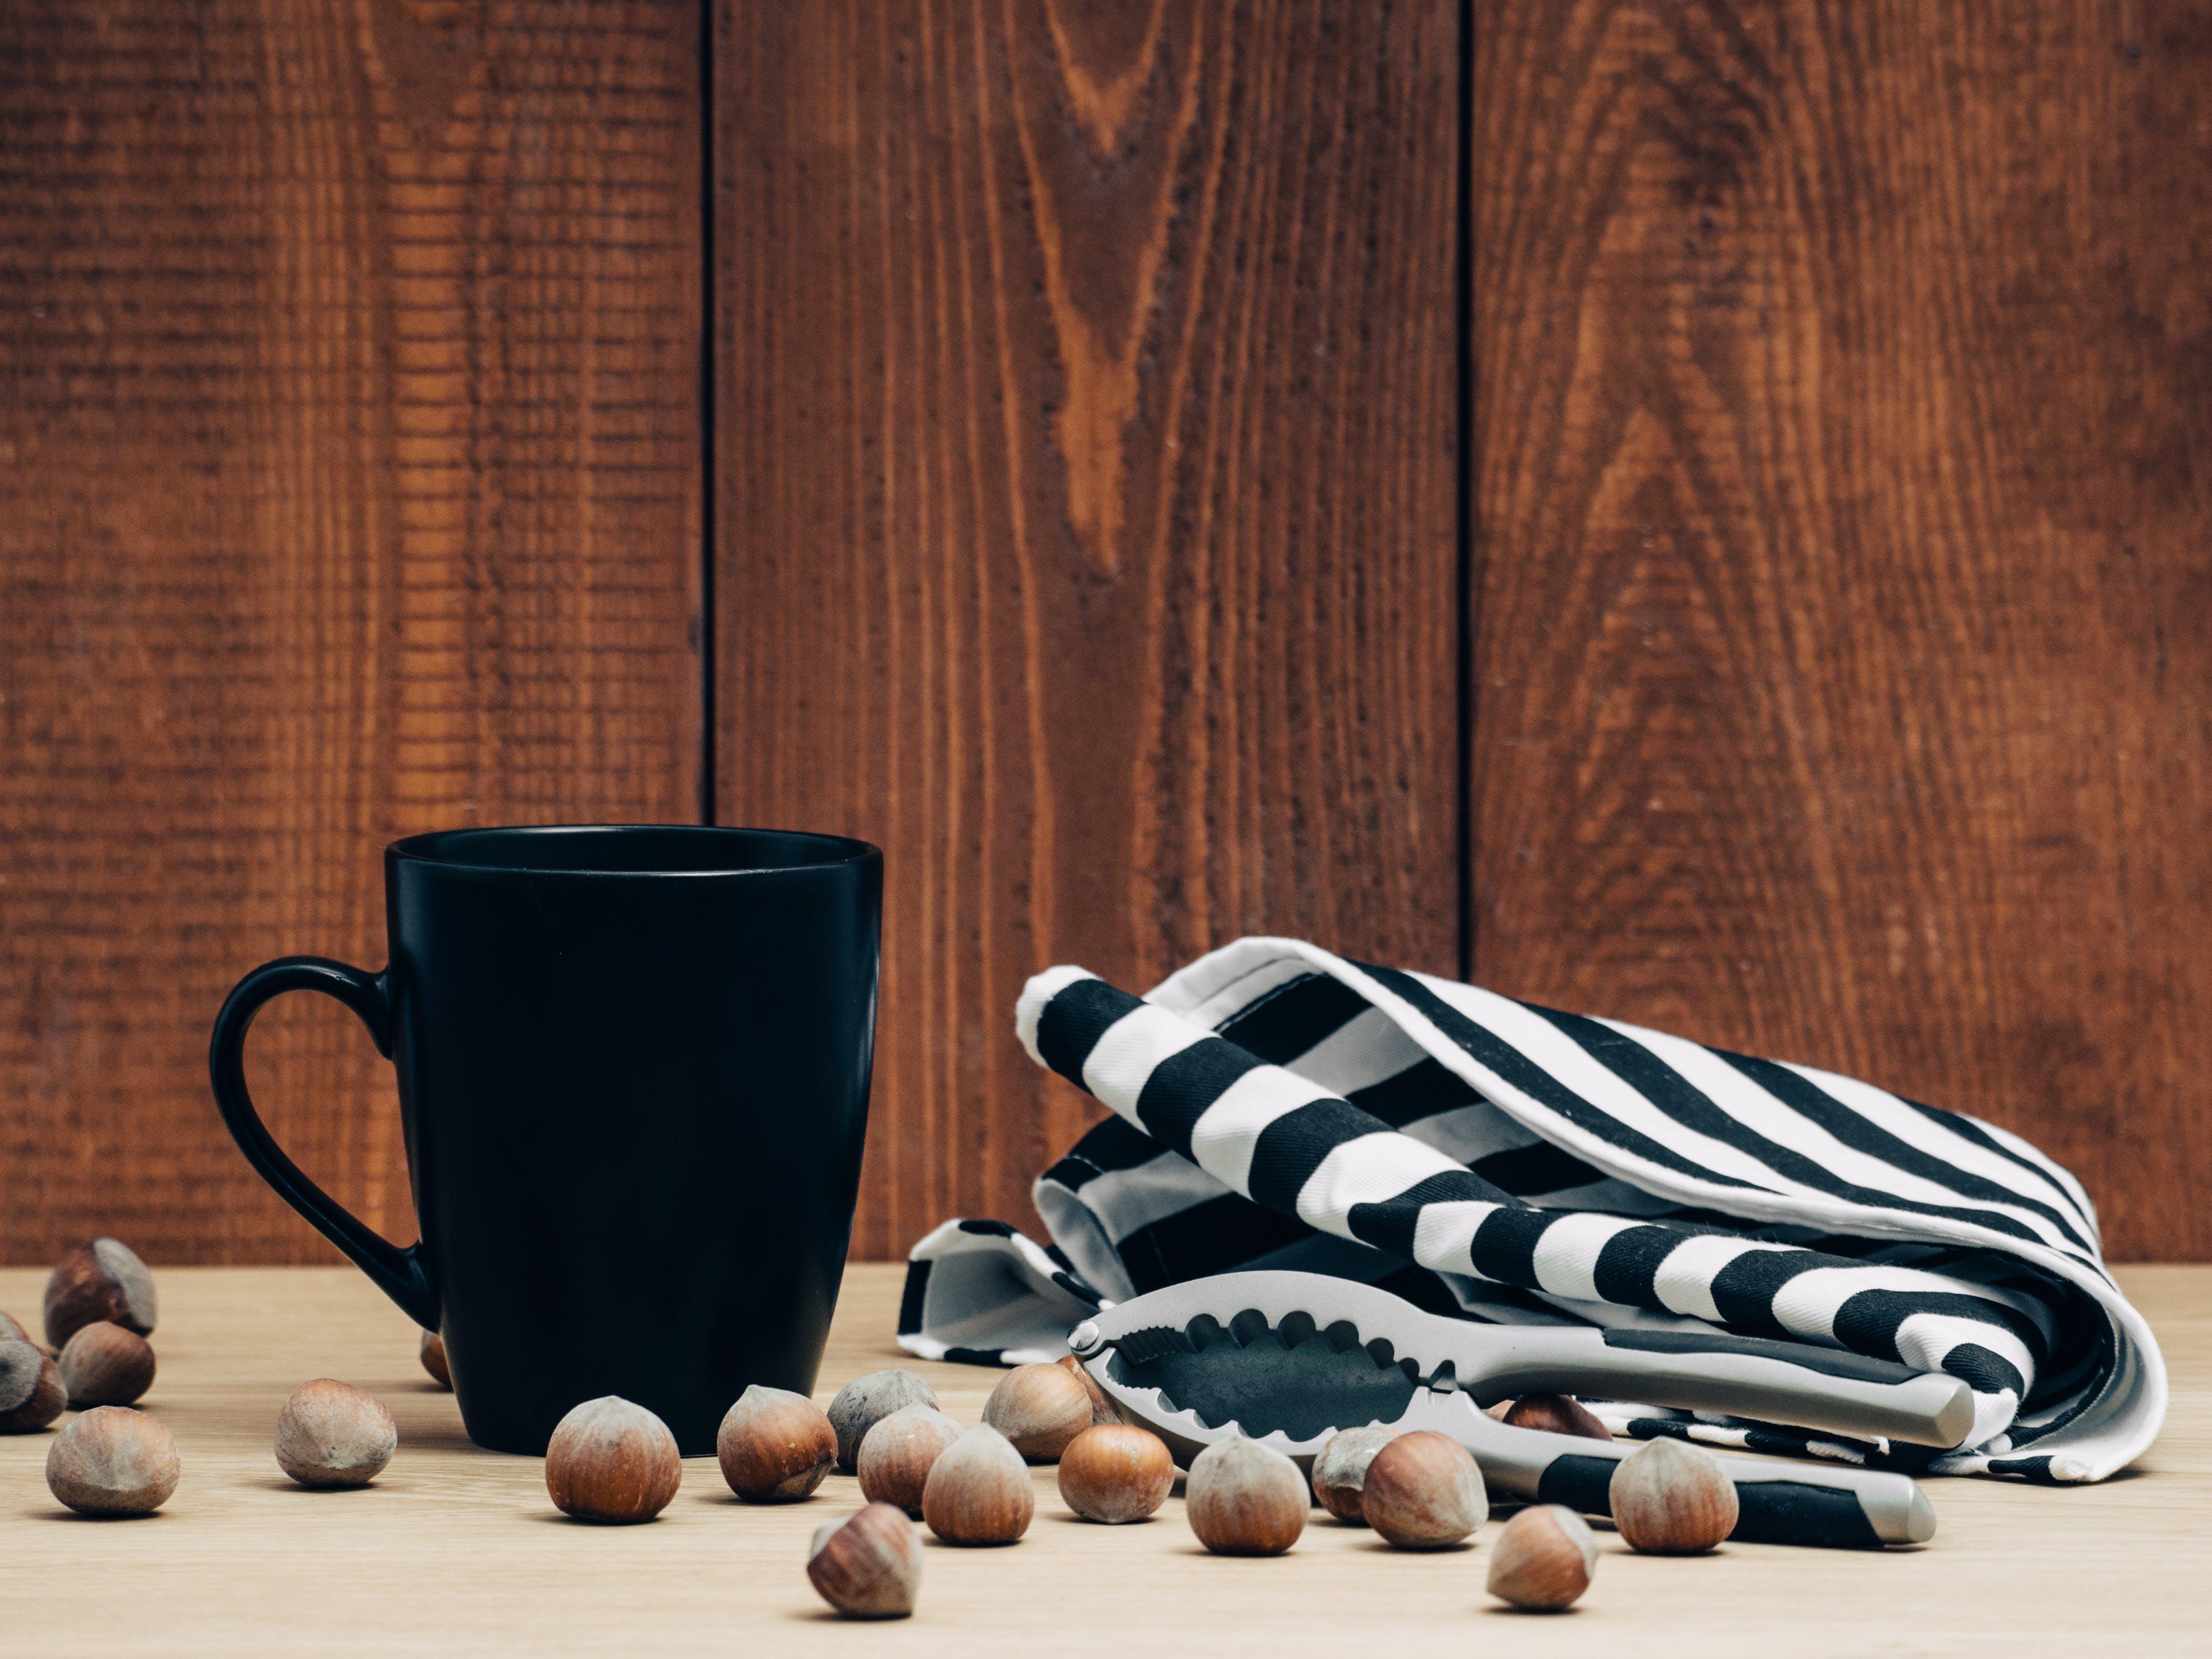 beverage, coffee, hazelnuts